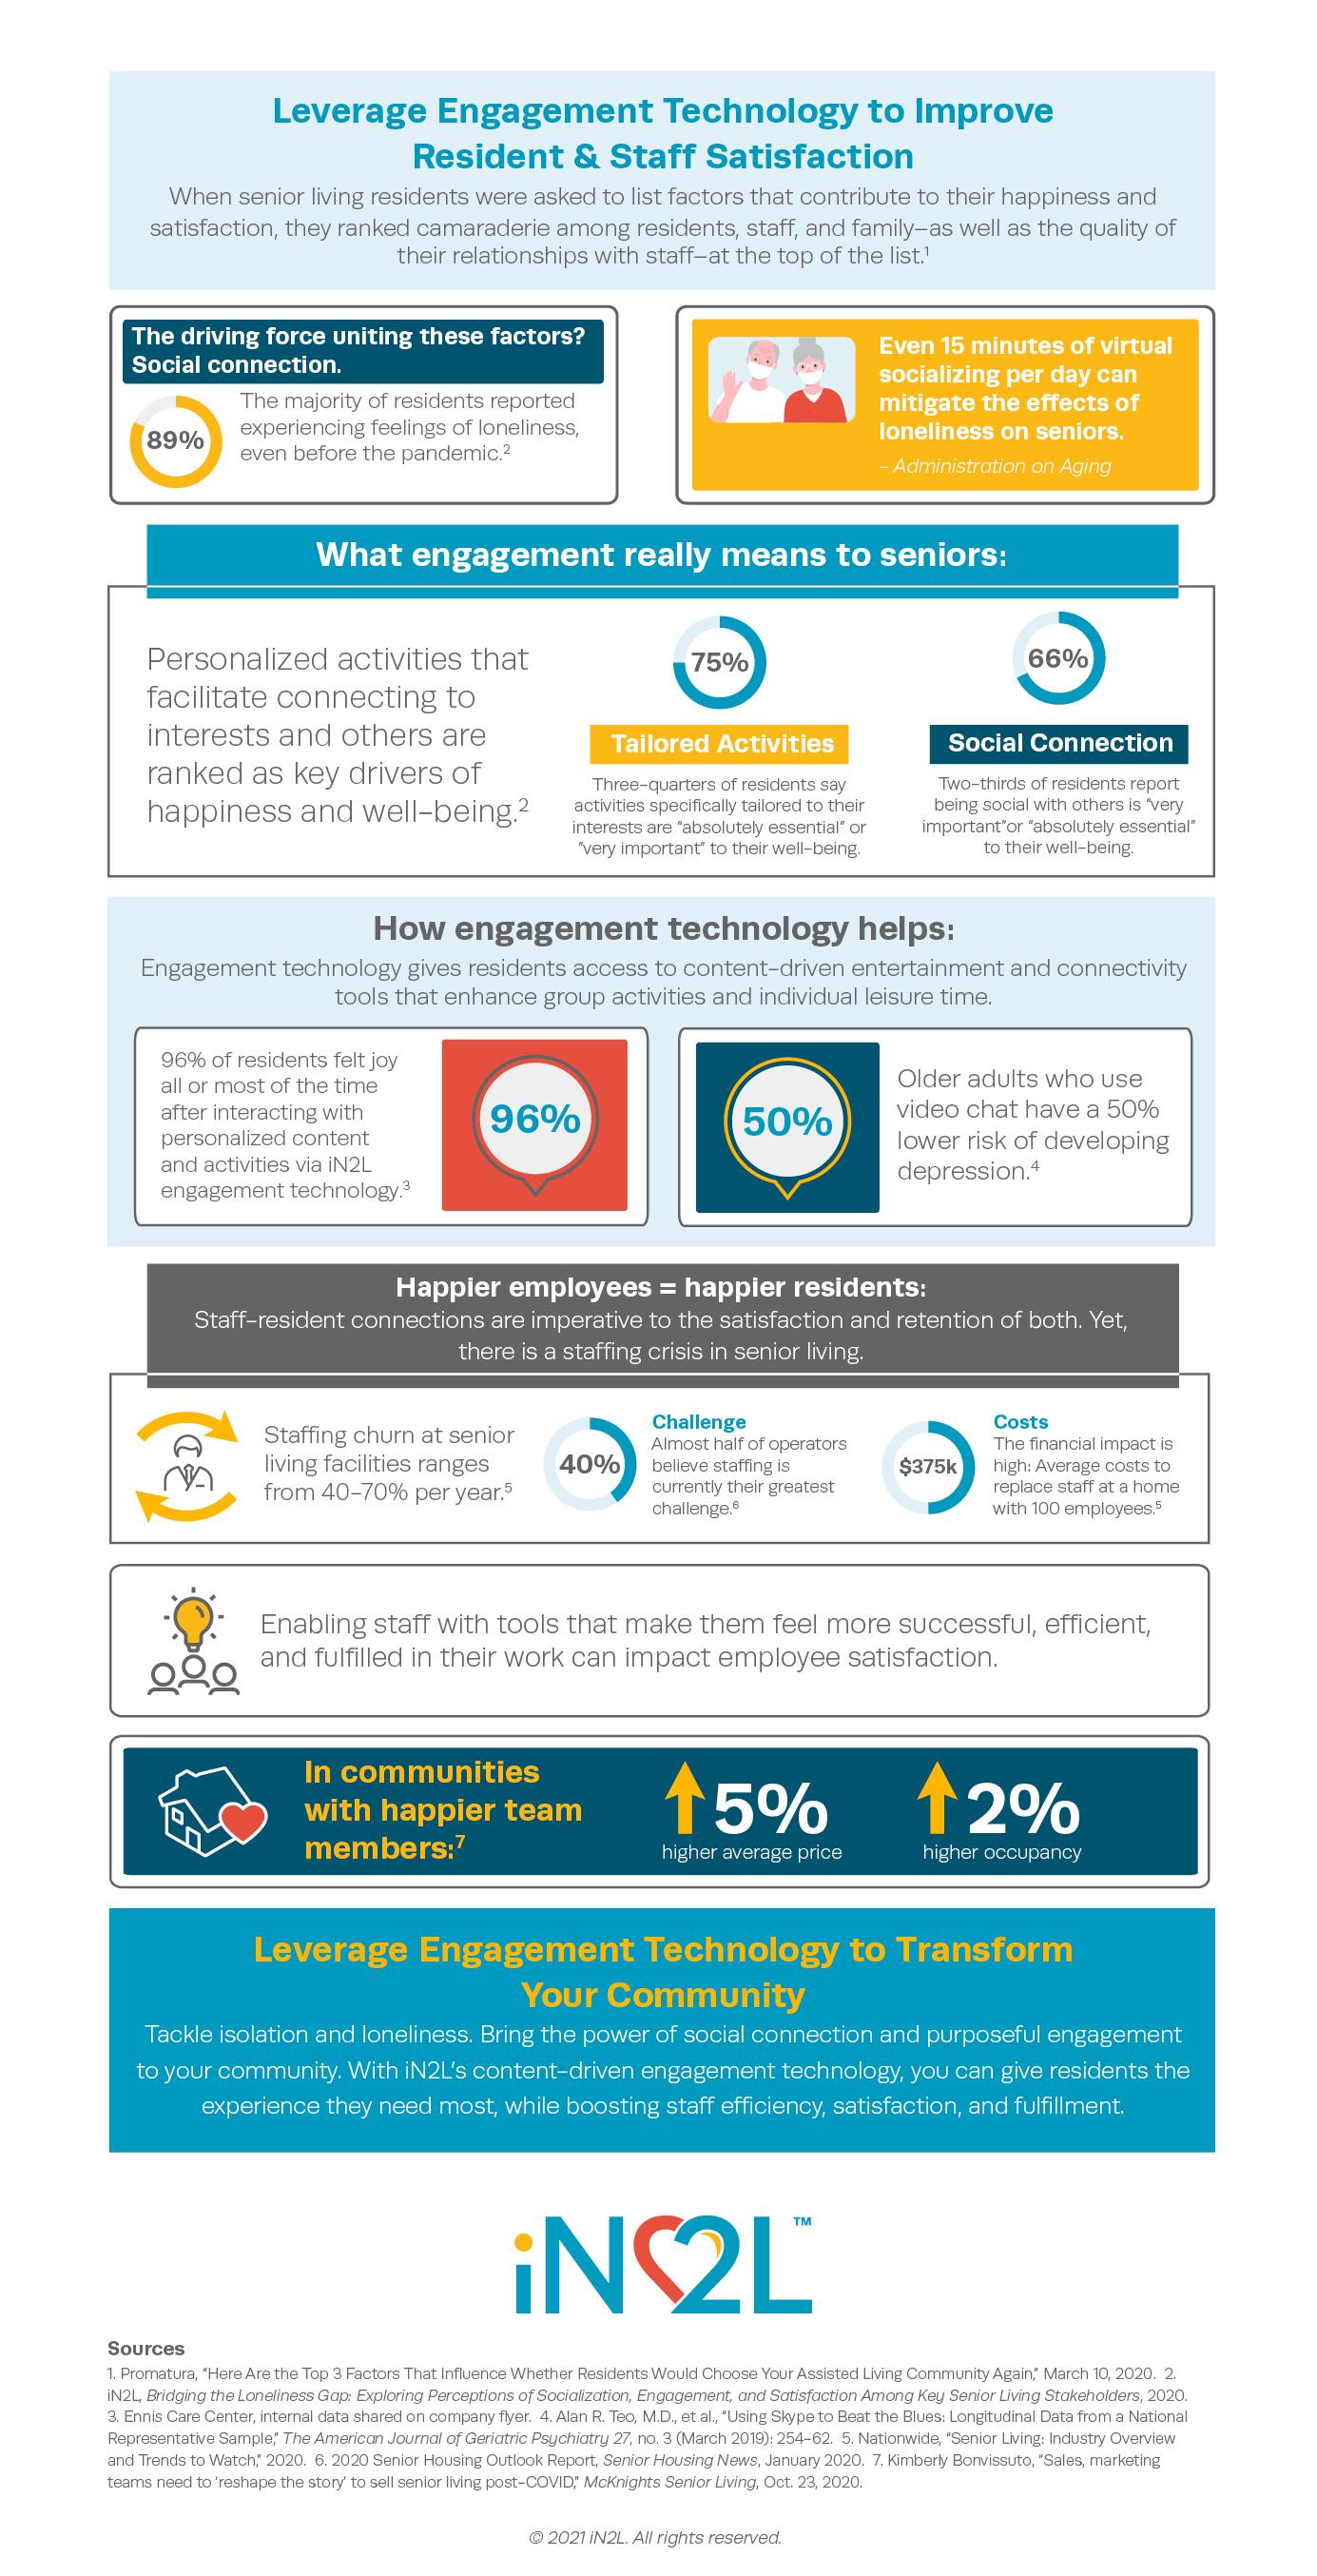 Infographic explains how engagement technology improves the senior living resident experience